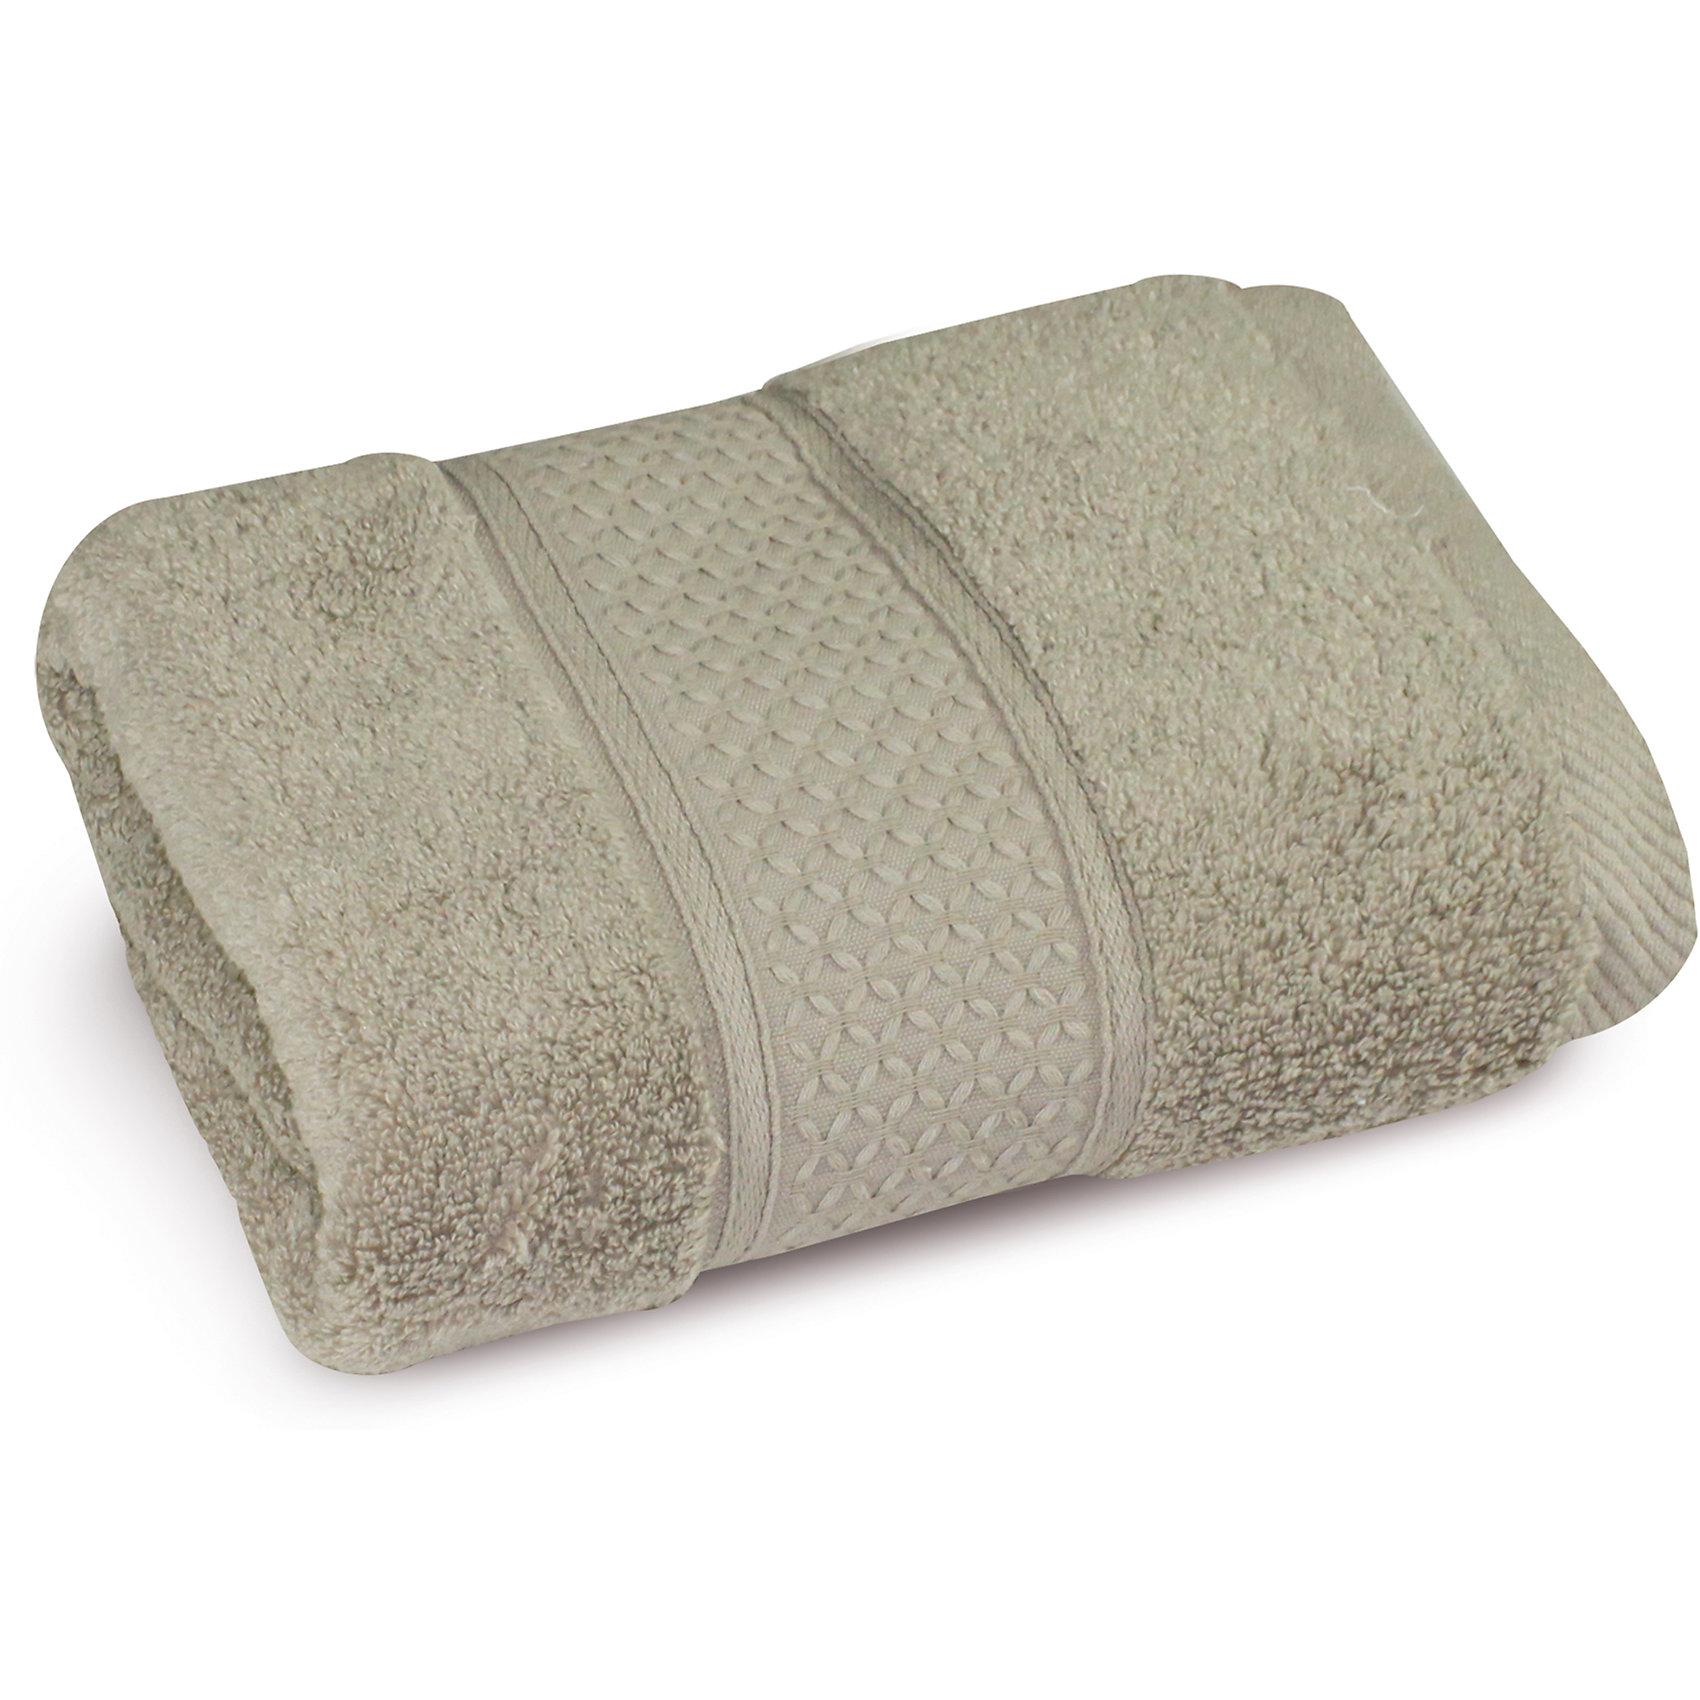 Полотенце махровое 30*70, Cozy Home, серый